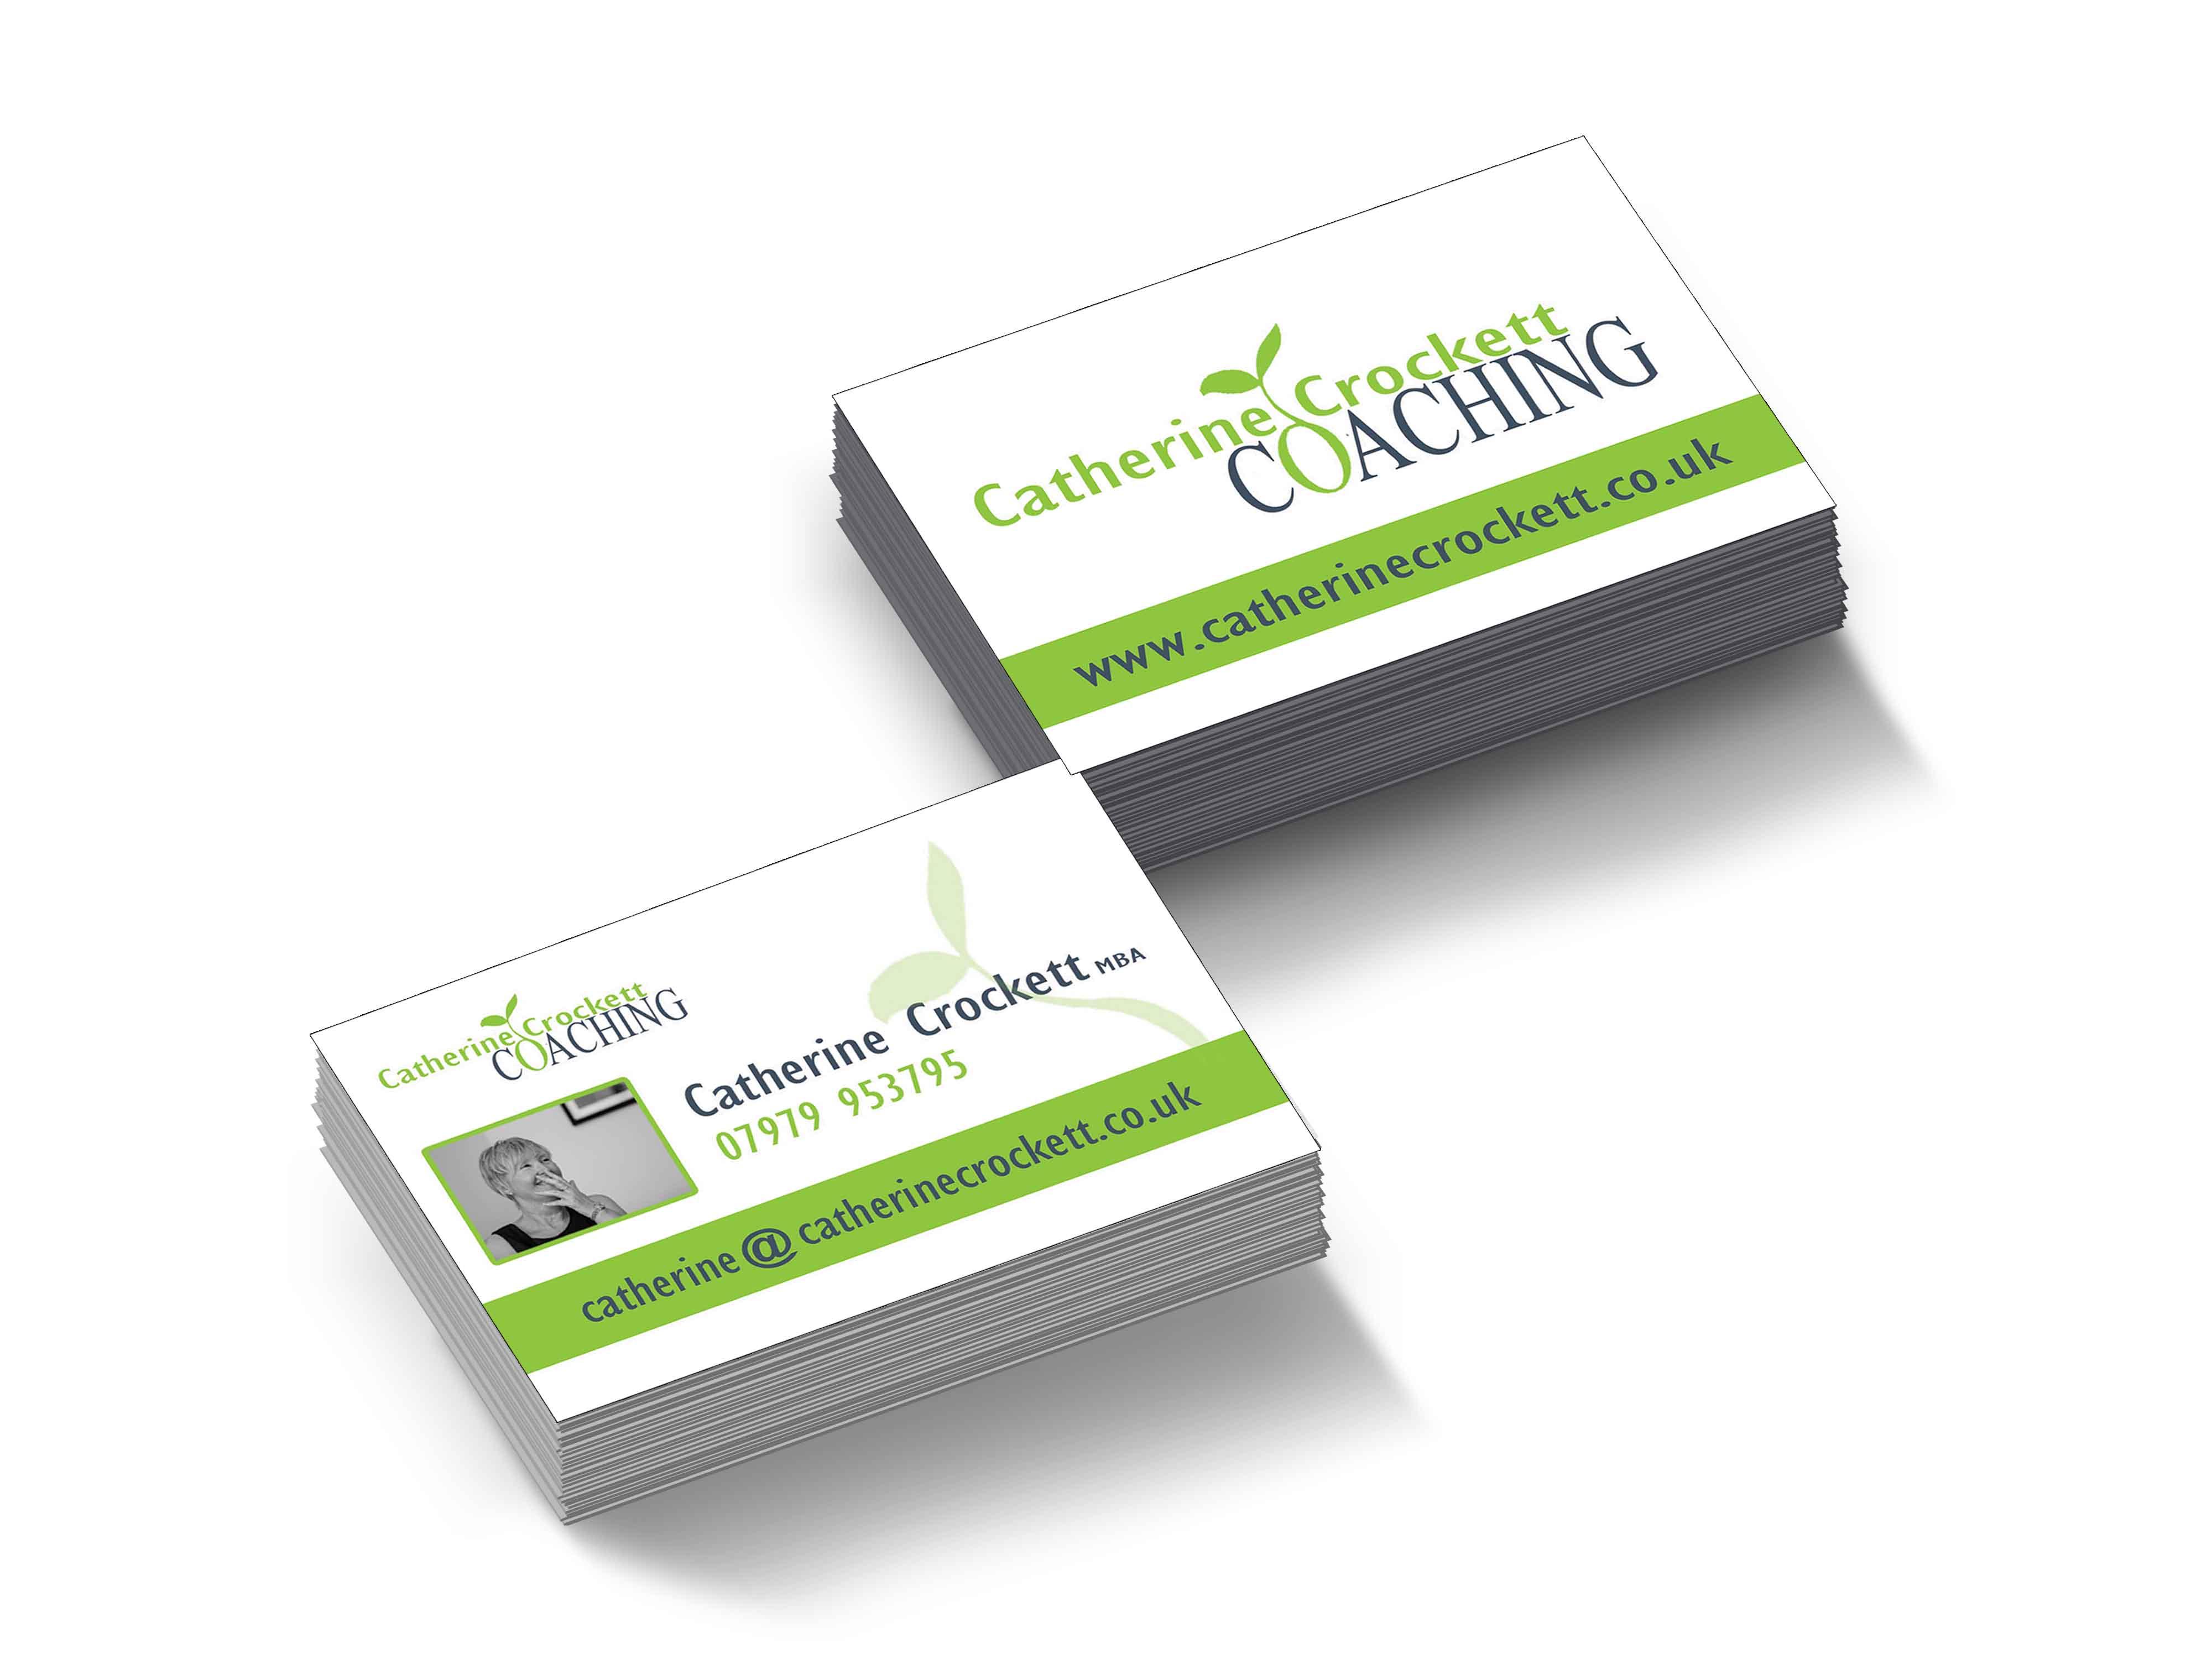 Catherine Crockett Business Cards